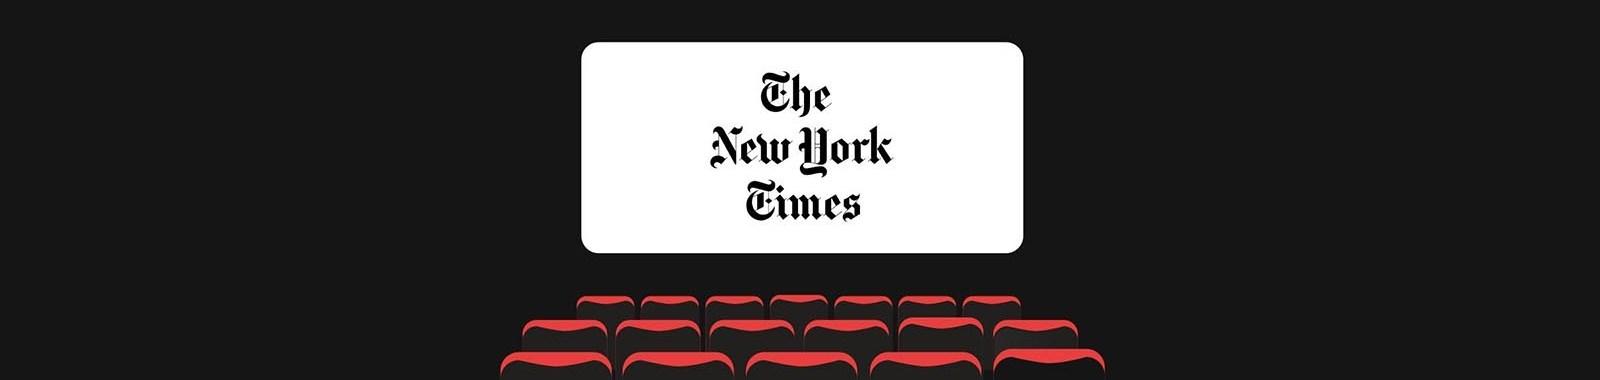 NYT_moviescreen-eye